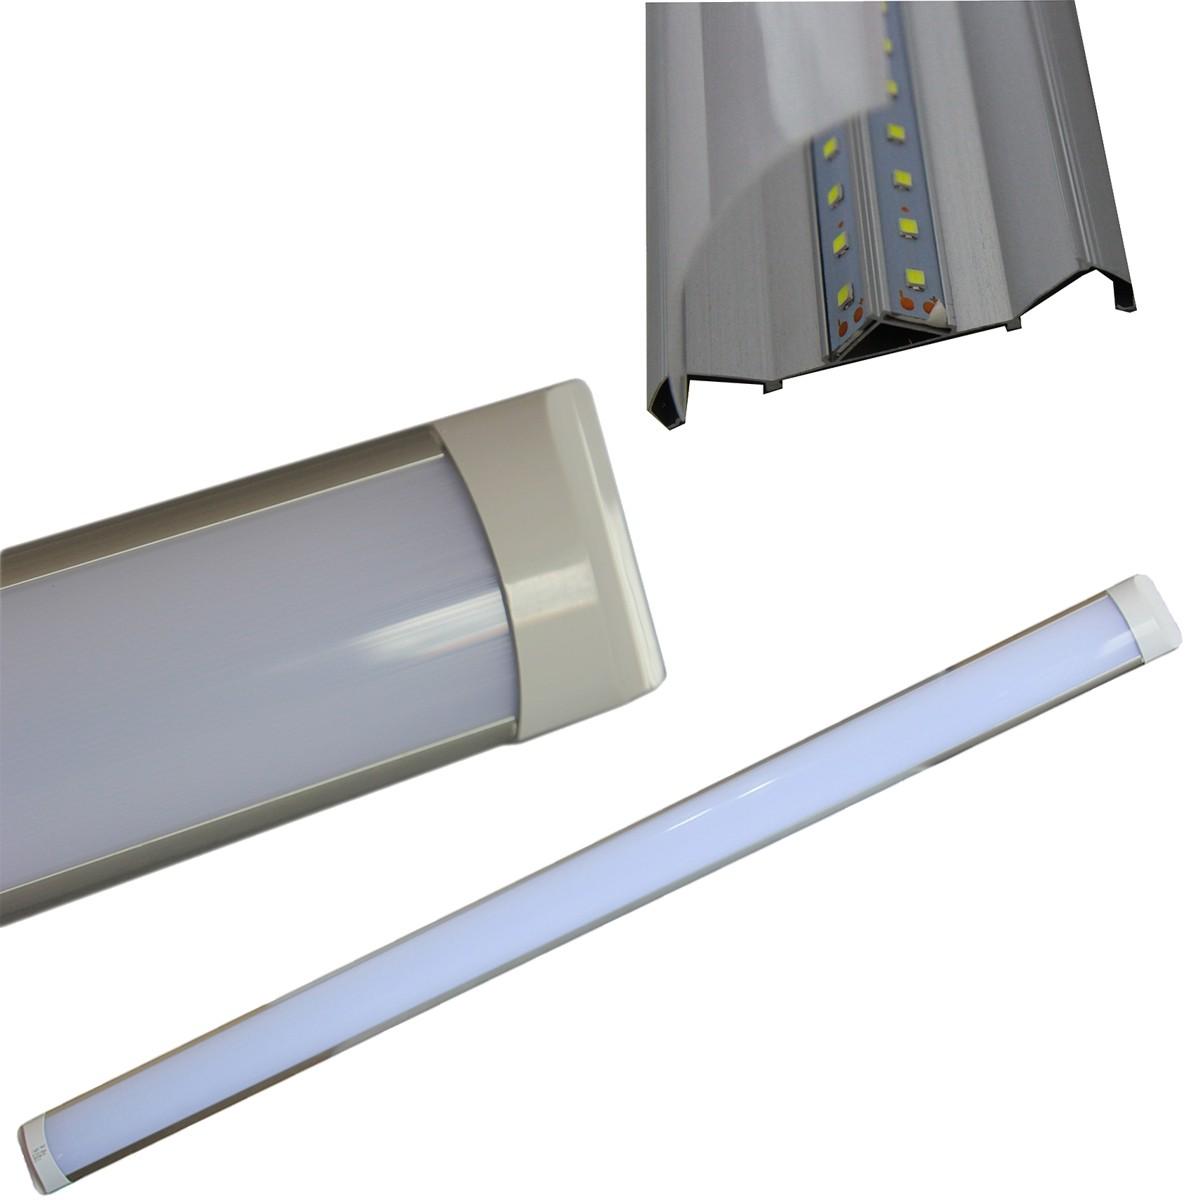 PLAFONIERA APPLIQUE LED SLIM SMD SOFFITTO 220V LUCE LAMPADA 36 W ...